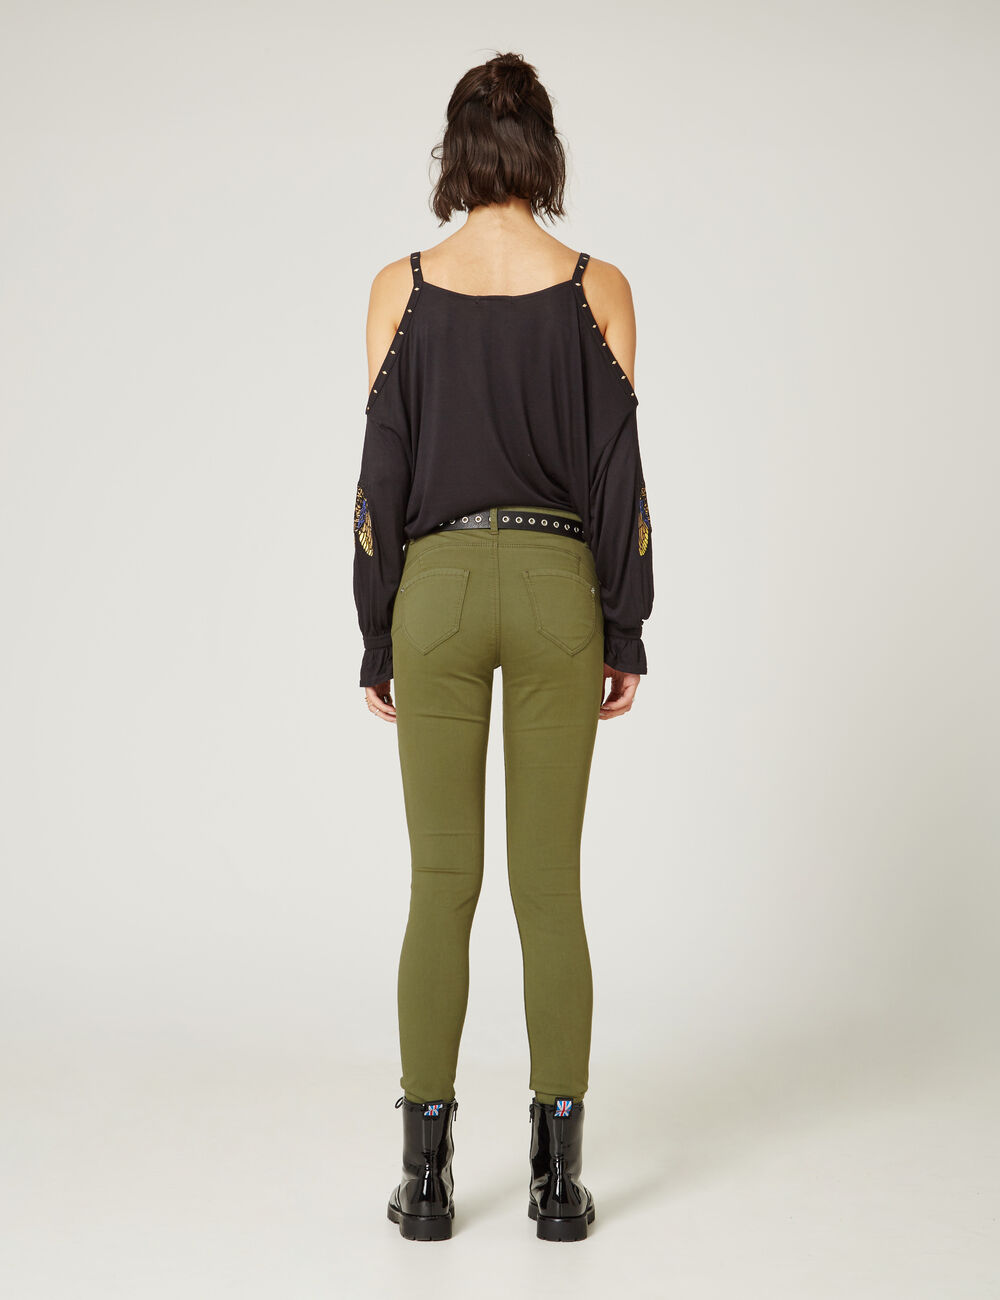 pantalon skinny push up kaki femme jennyfer. Black Bedroom Furniture Sets. Home Design Ideas